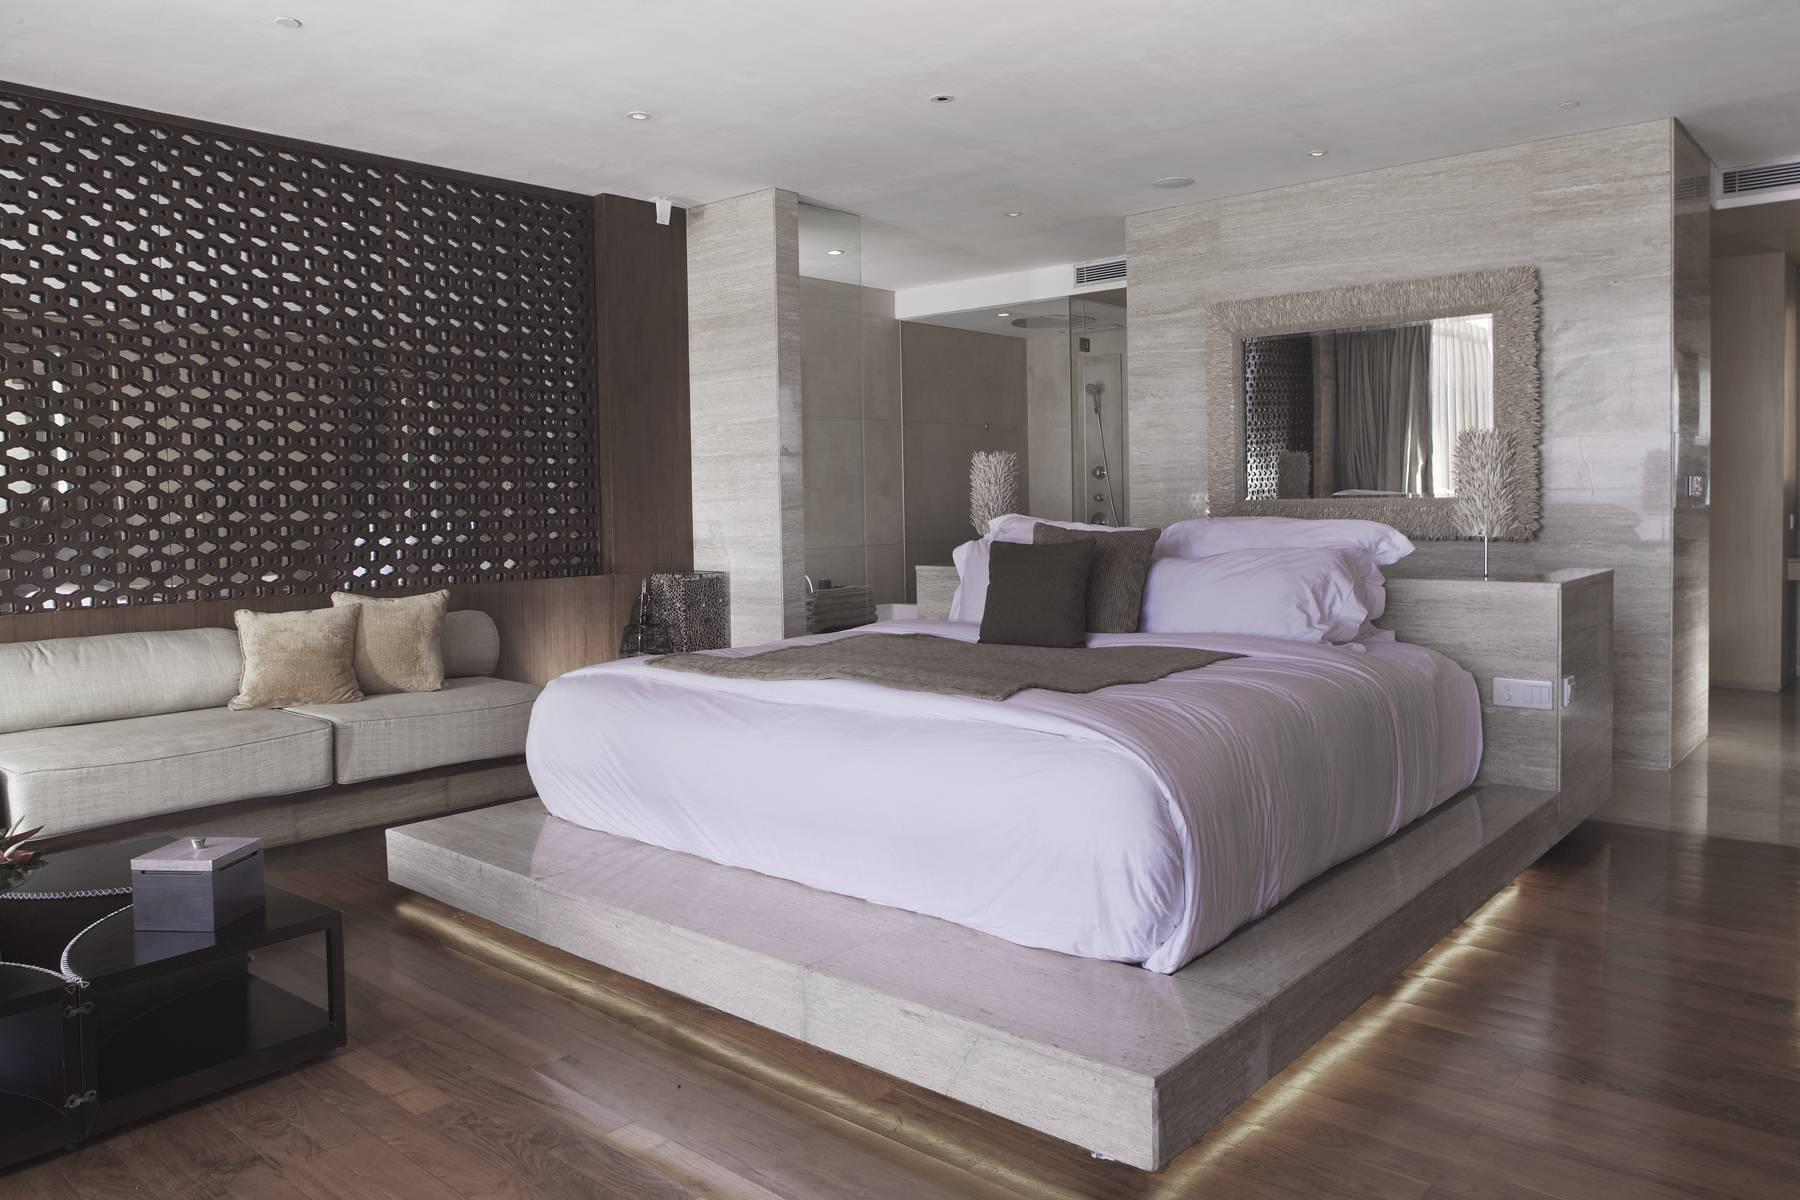 Antony Liu + Ferry Ridwan / Studio Tonton Anantara Seminyak Bali Resort Seminyak, Bali, Indonesia Seminyak, Bali, Indonesia Bedroom Modern  8036